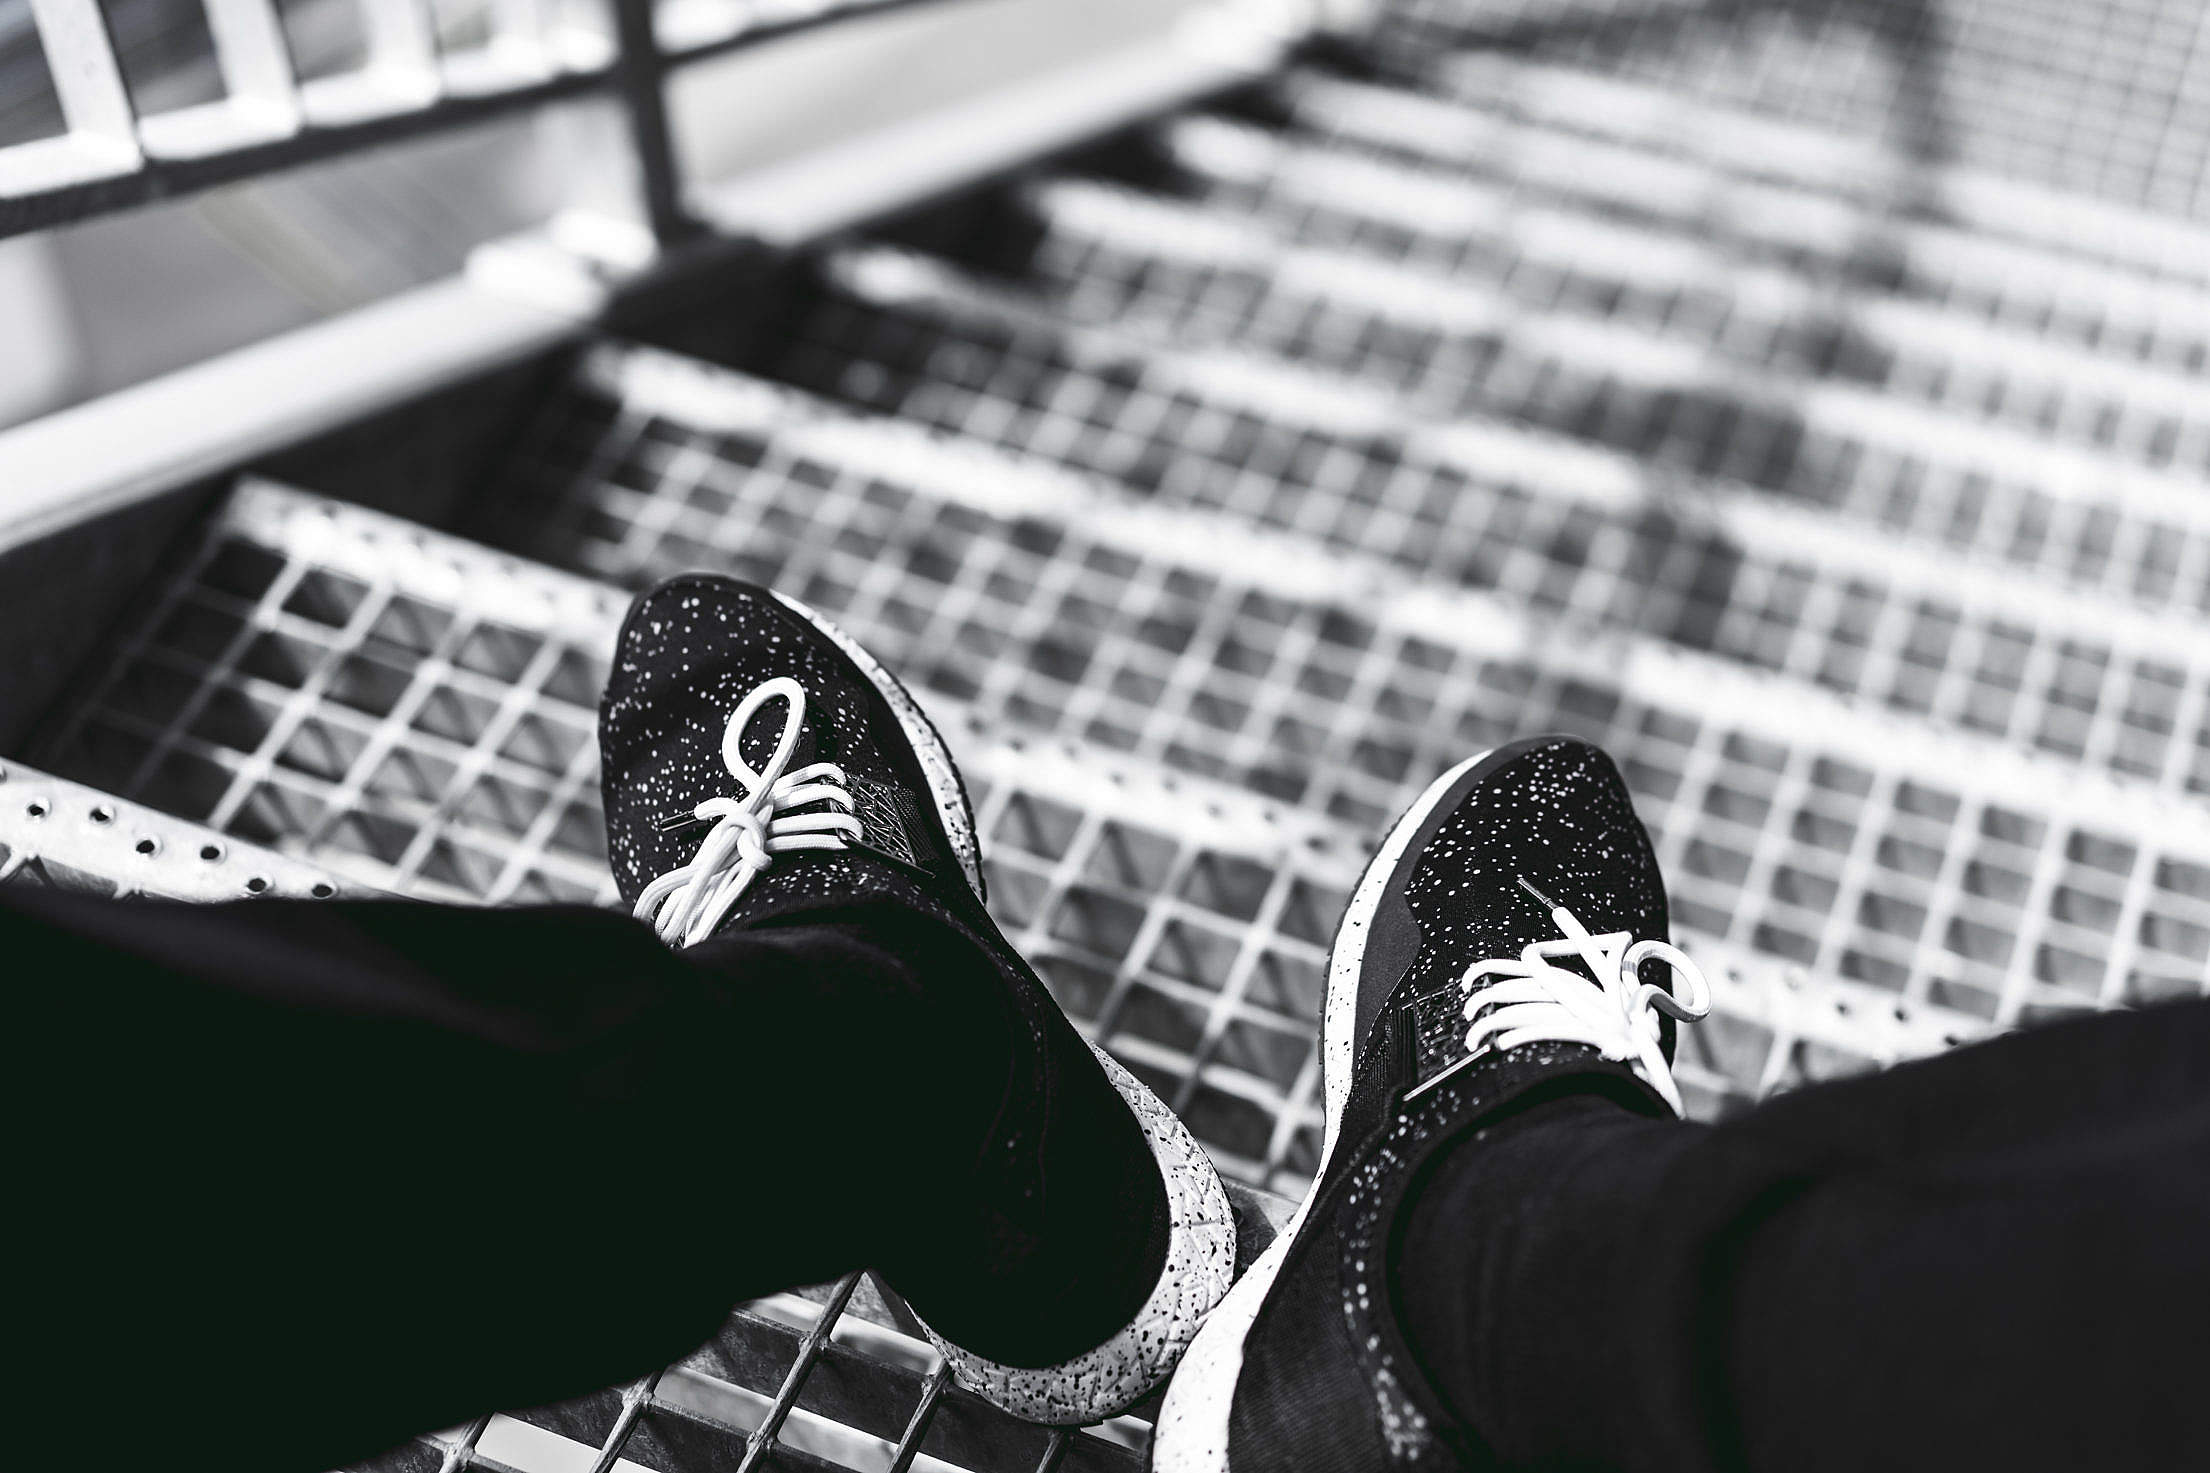 Men Streetwear Running Shoes Free Stock Photo